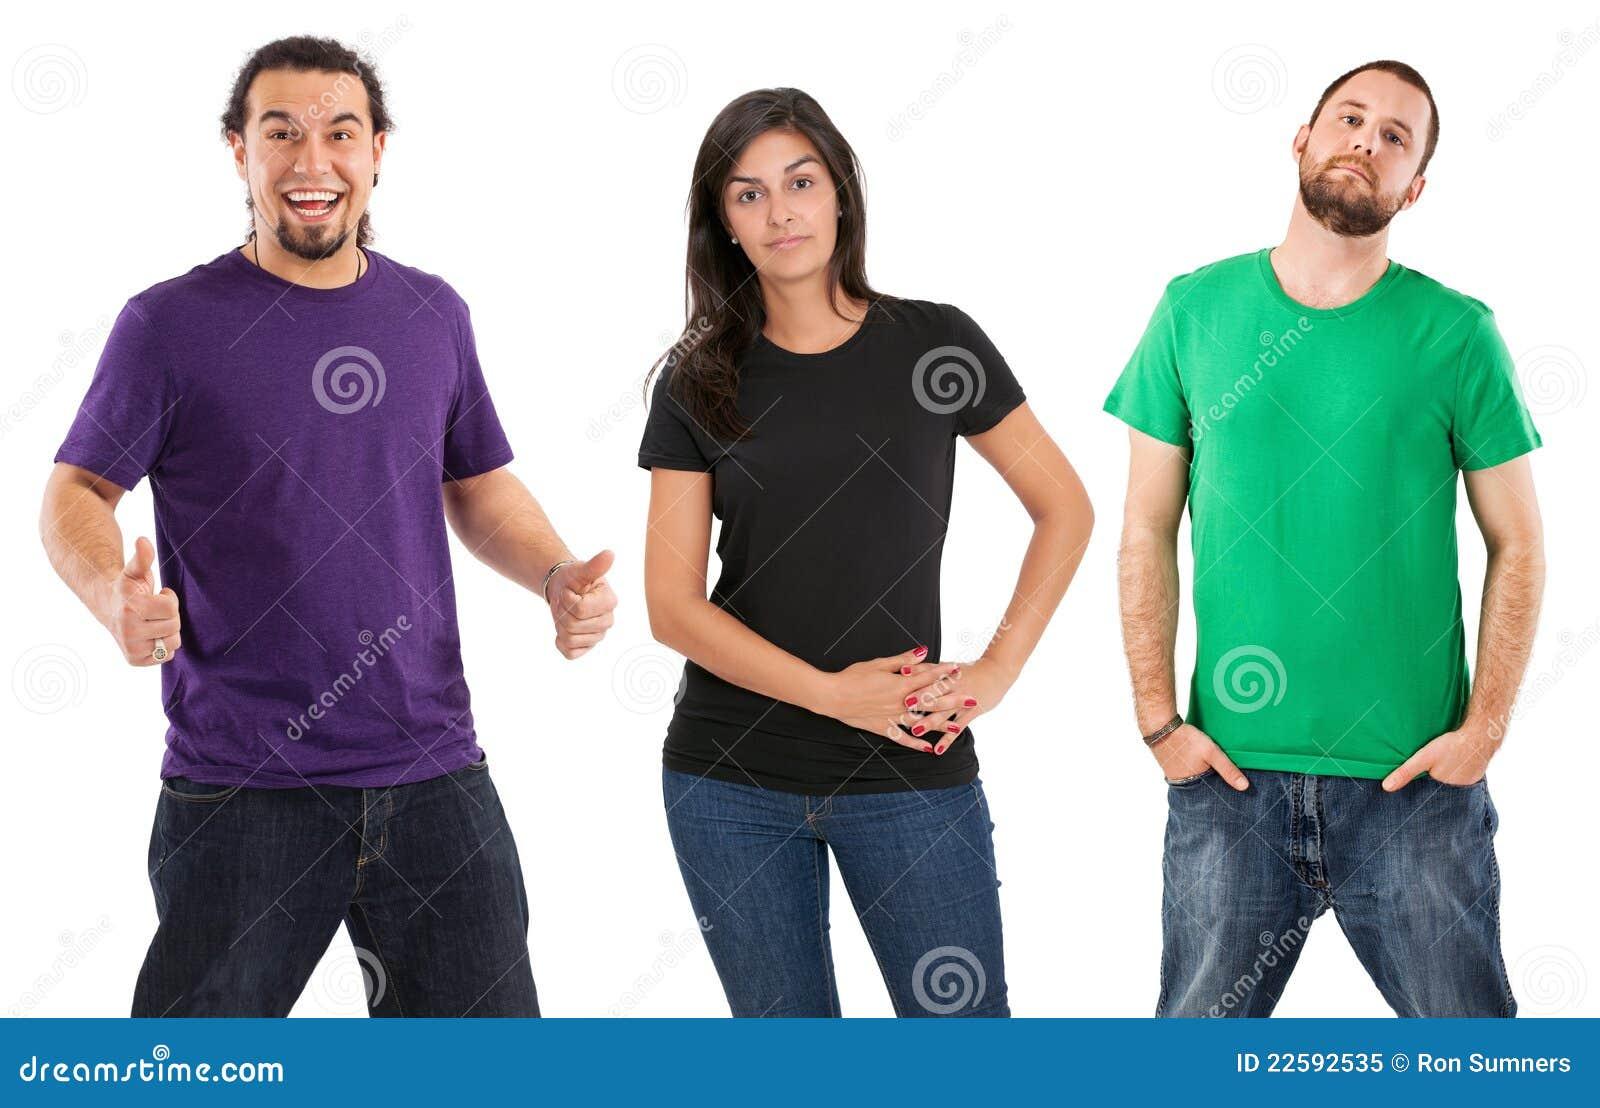 standing people blank shirts royalty stehen hemden leute unbelegten mit released model preview